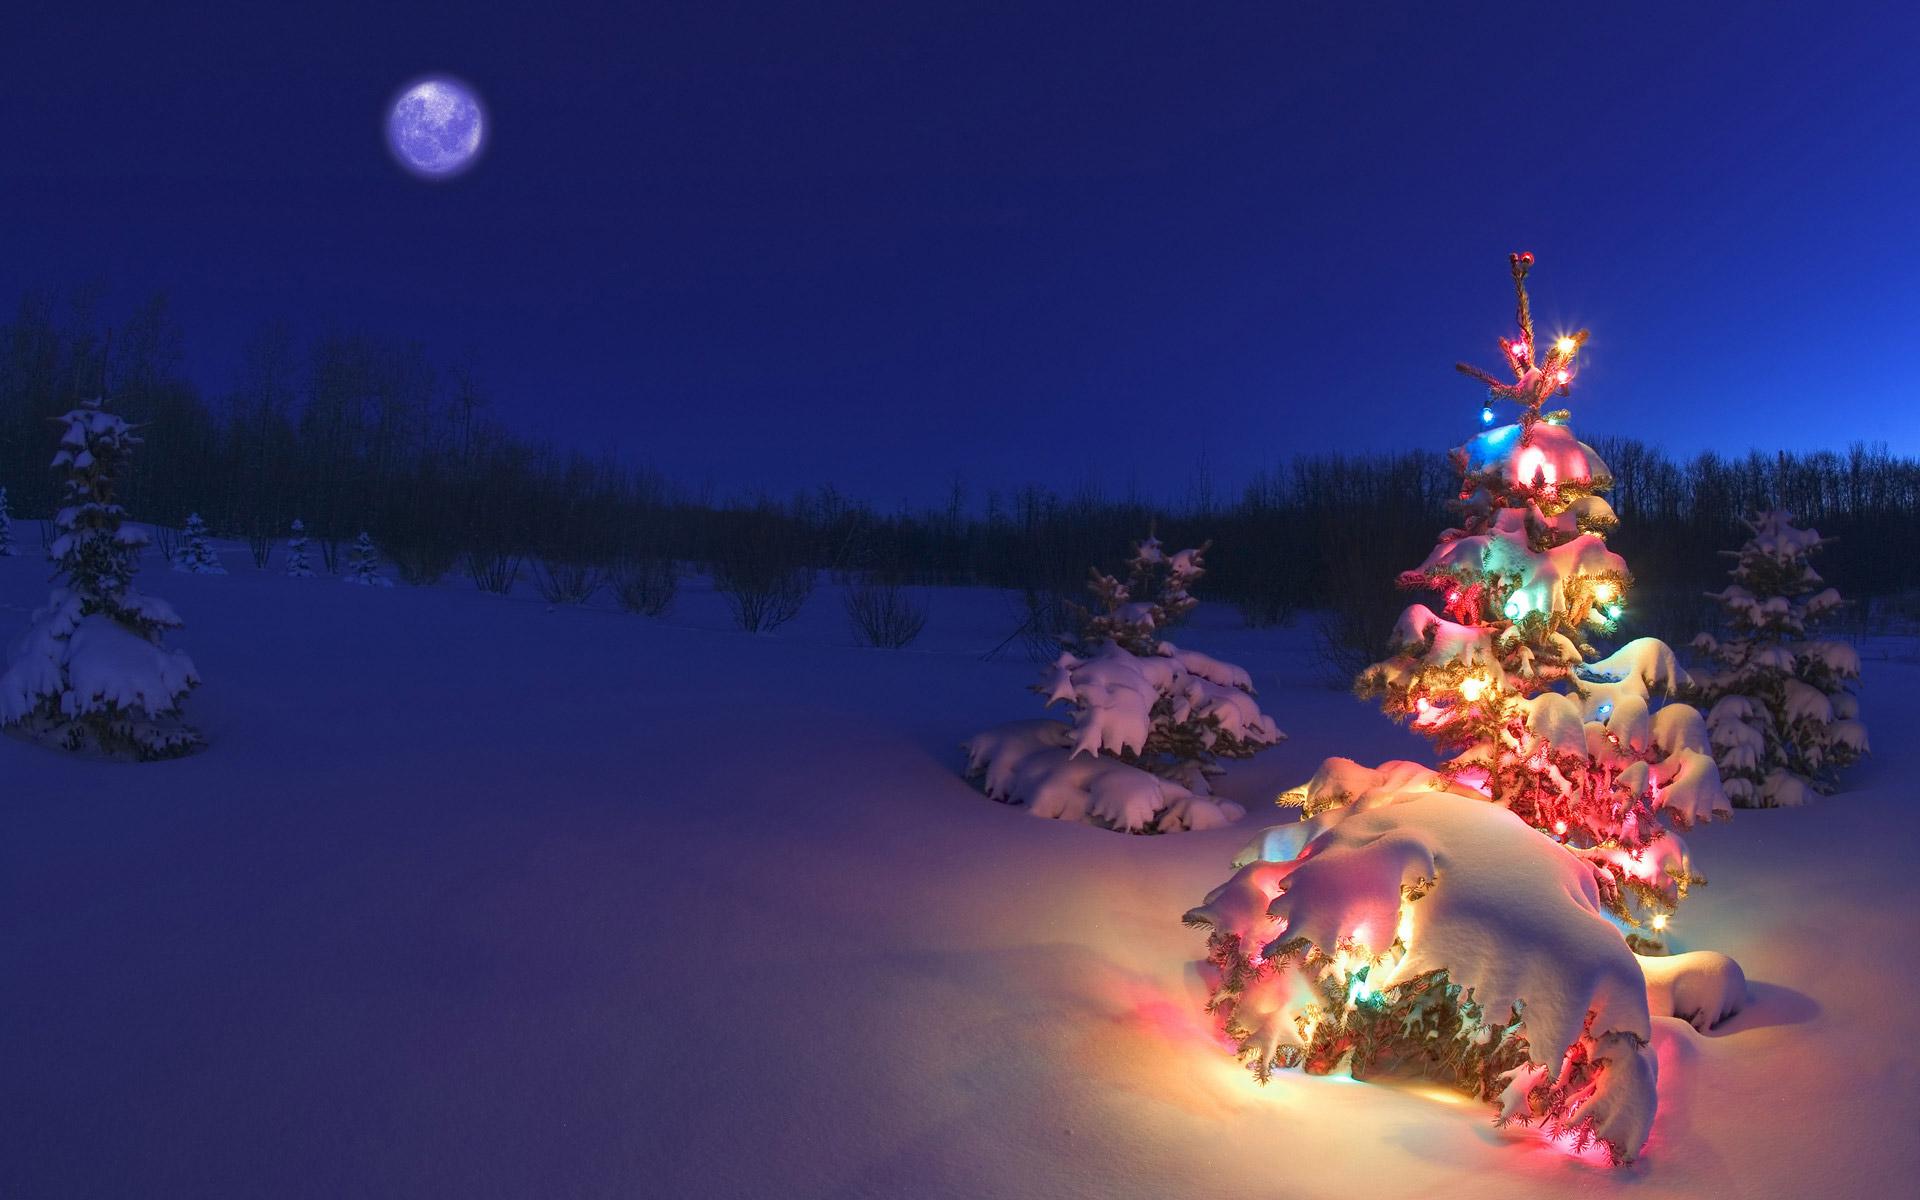 ������ ���� ��� ������� 2013 - Christmas Trees HD Wallpaper 2013- ������ ���� ������� 2013